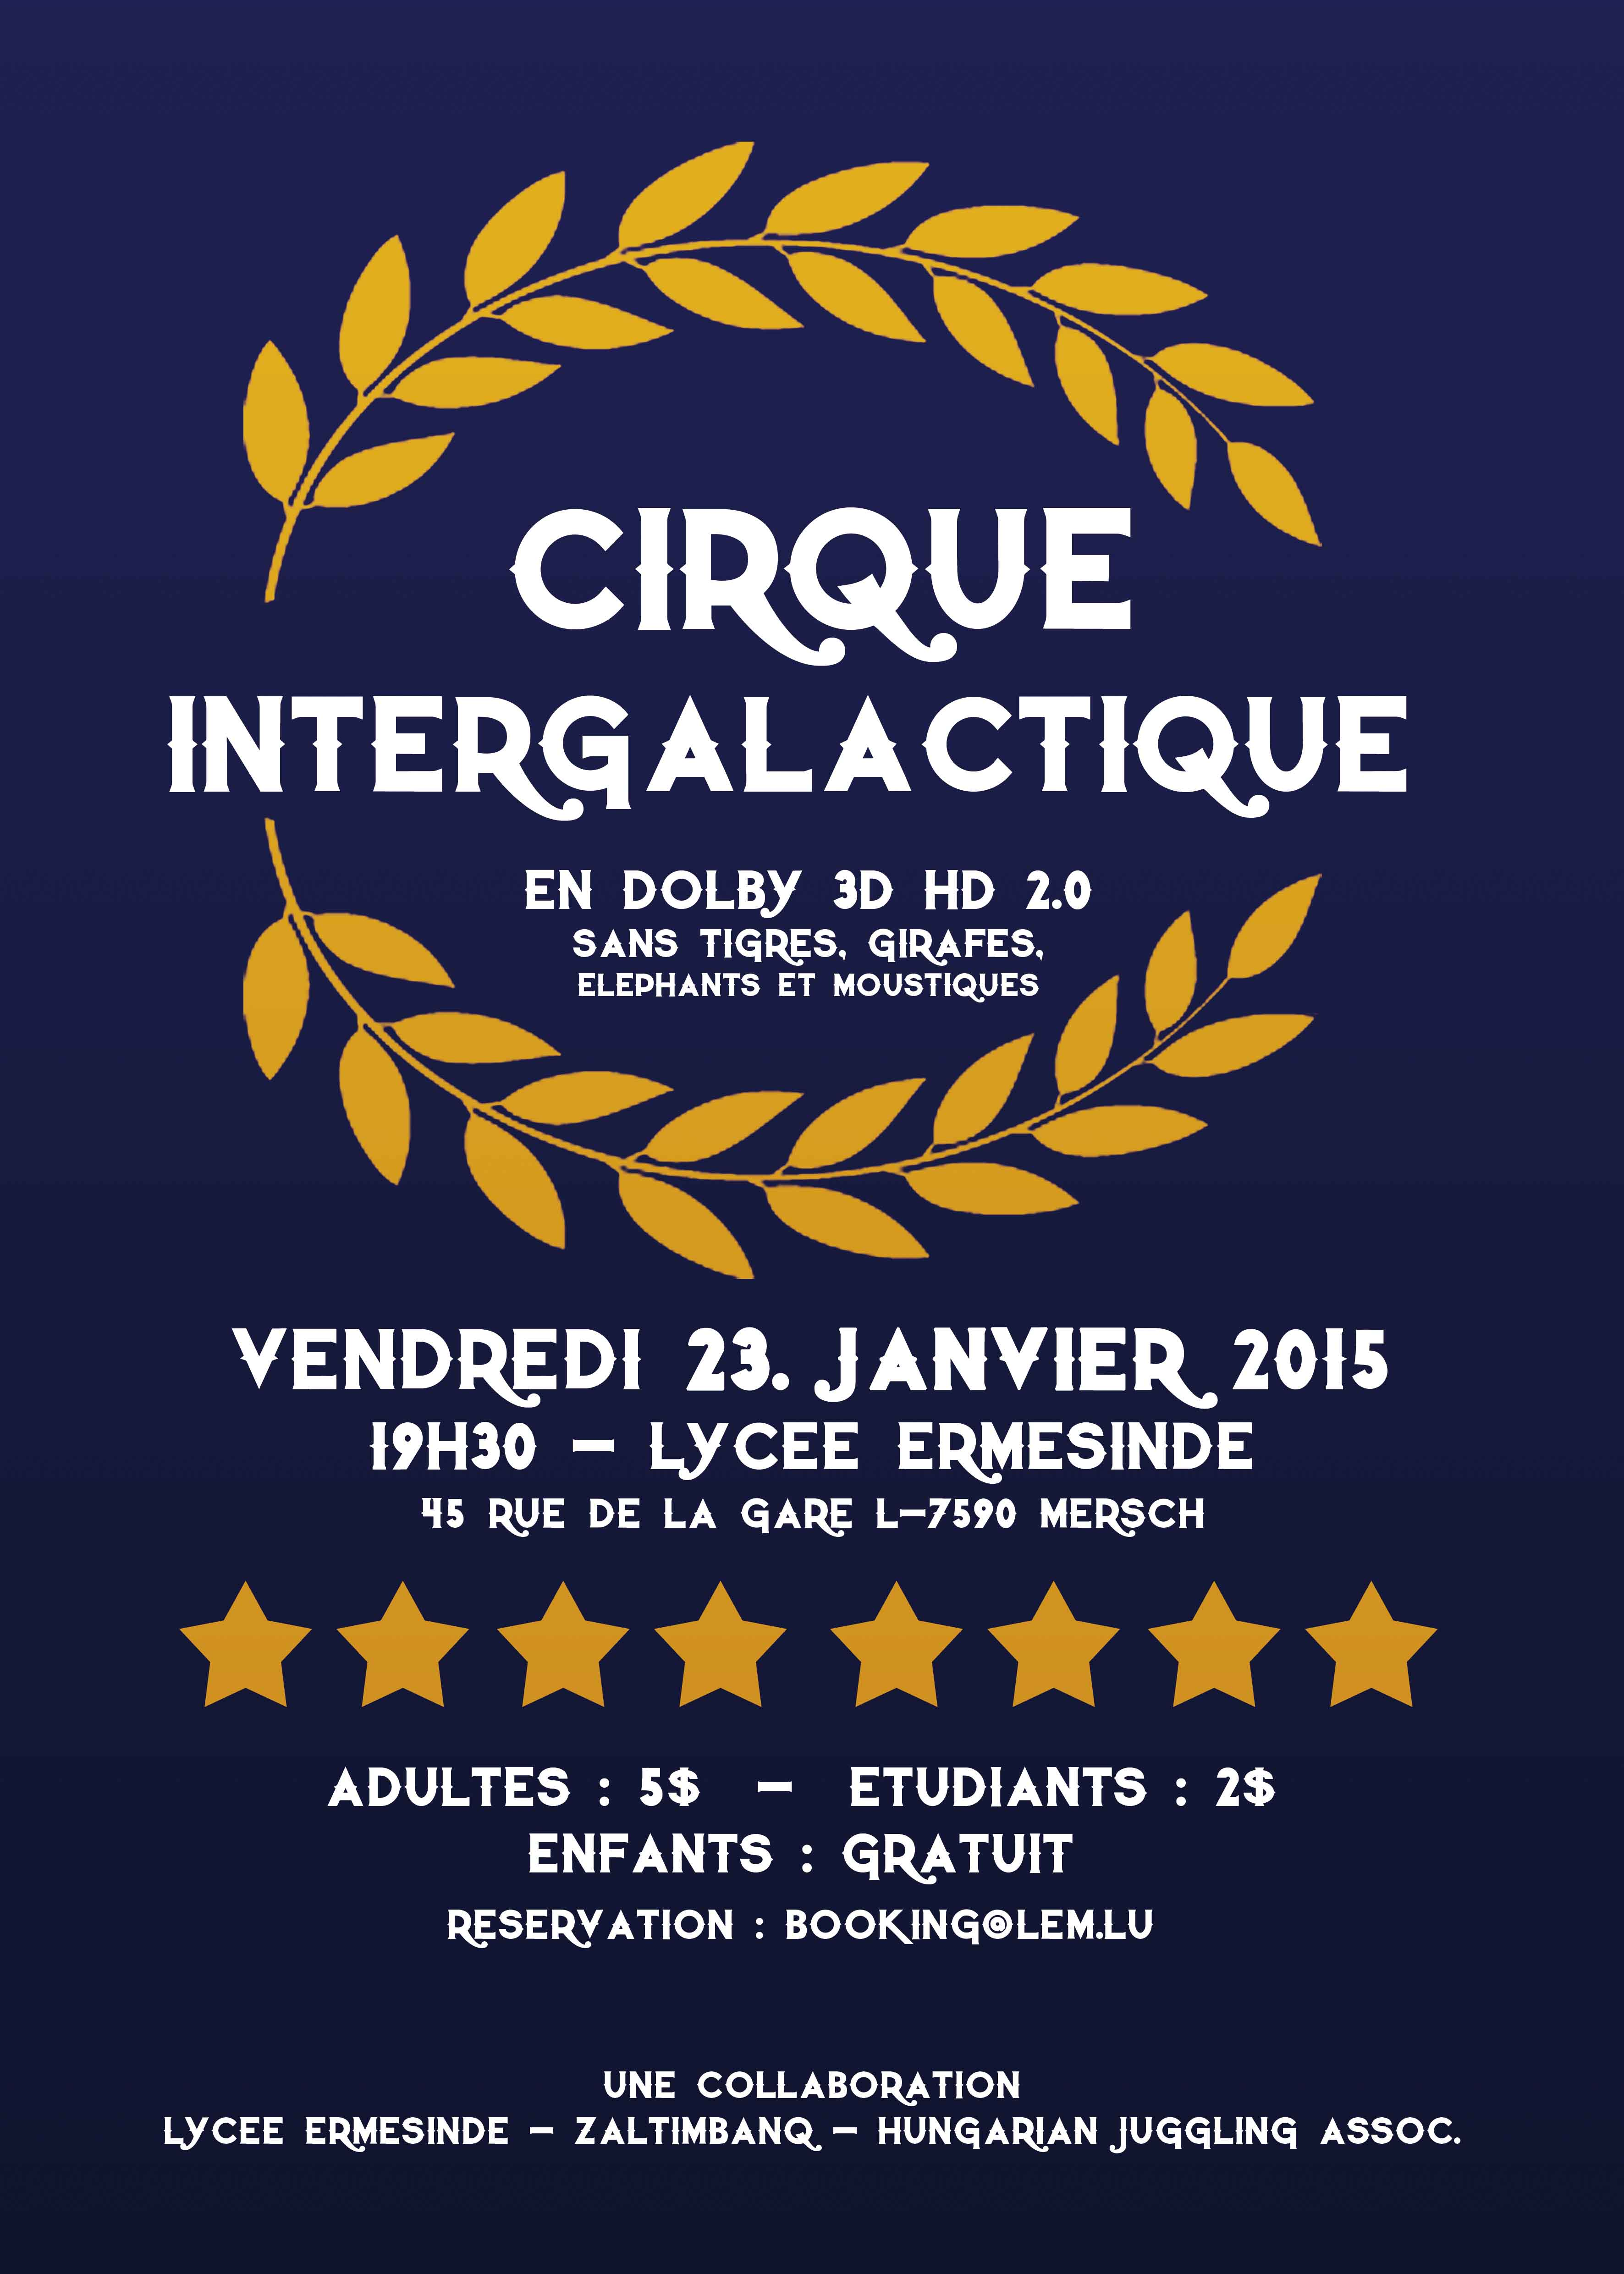 2015 cirque intergalactique v2.jpg